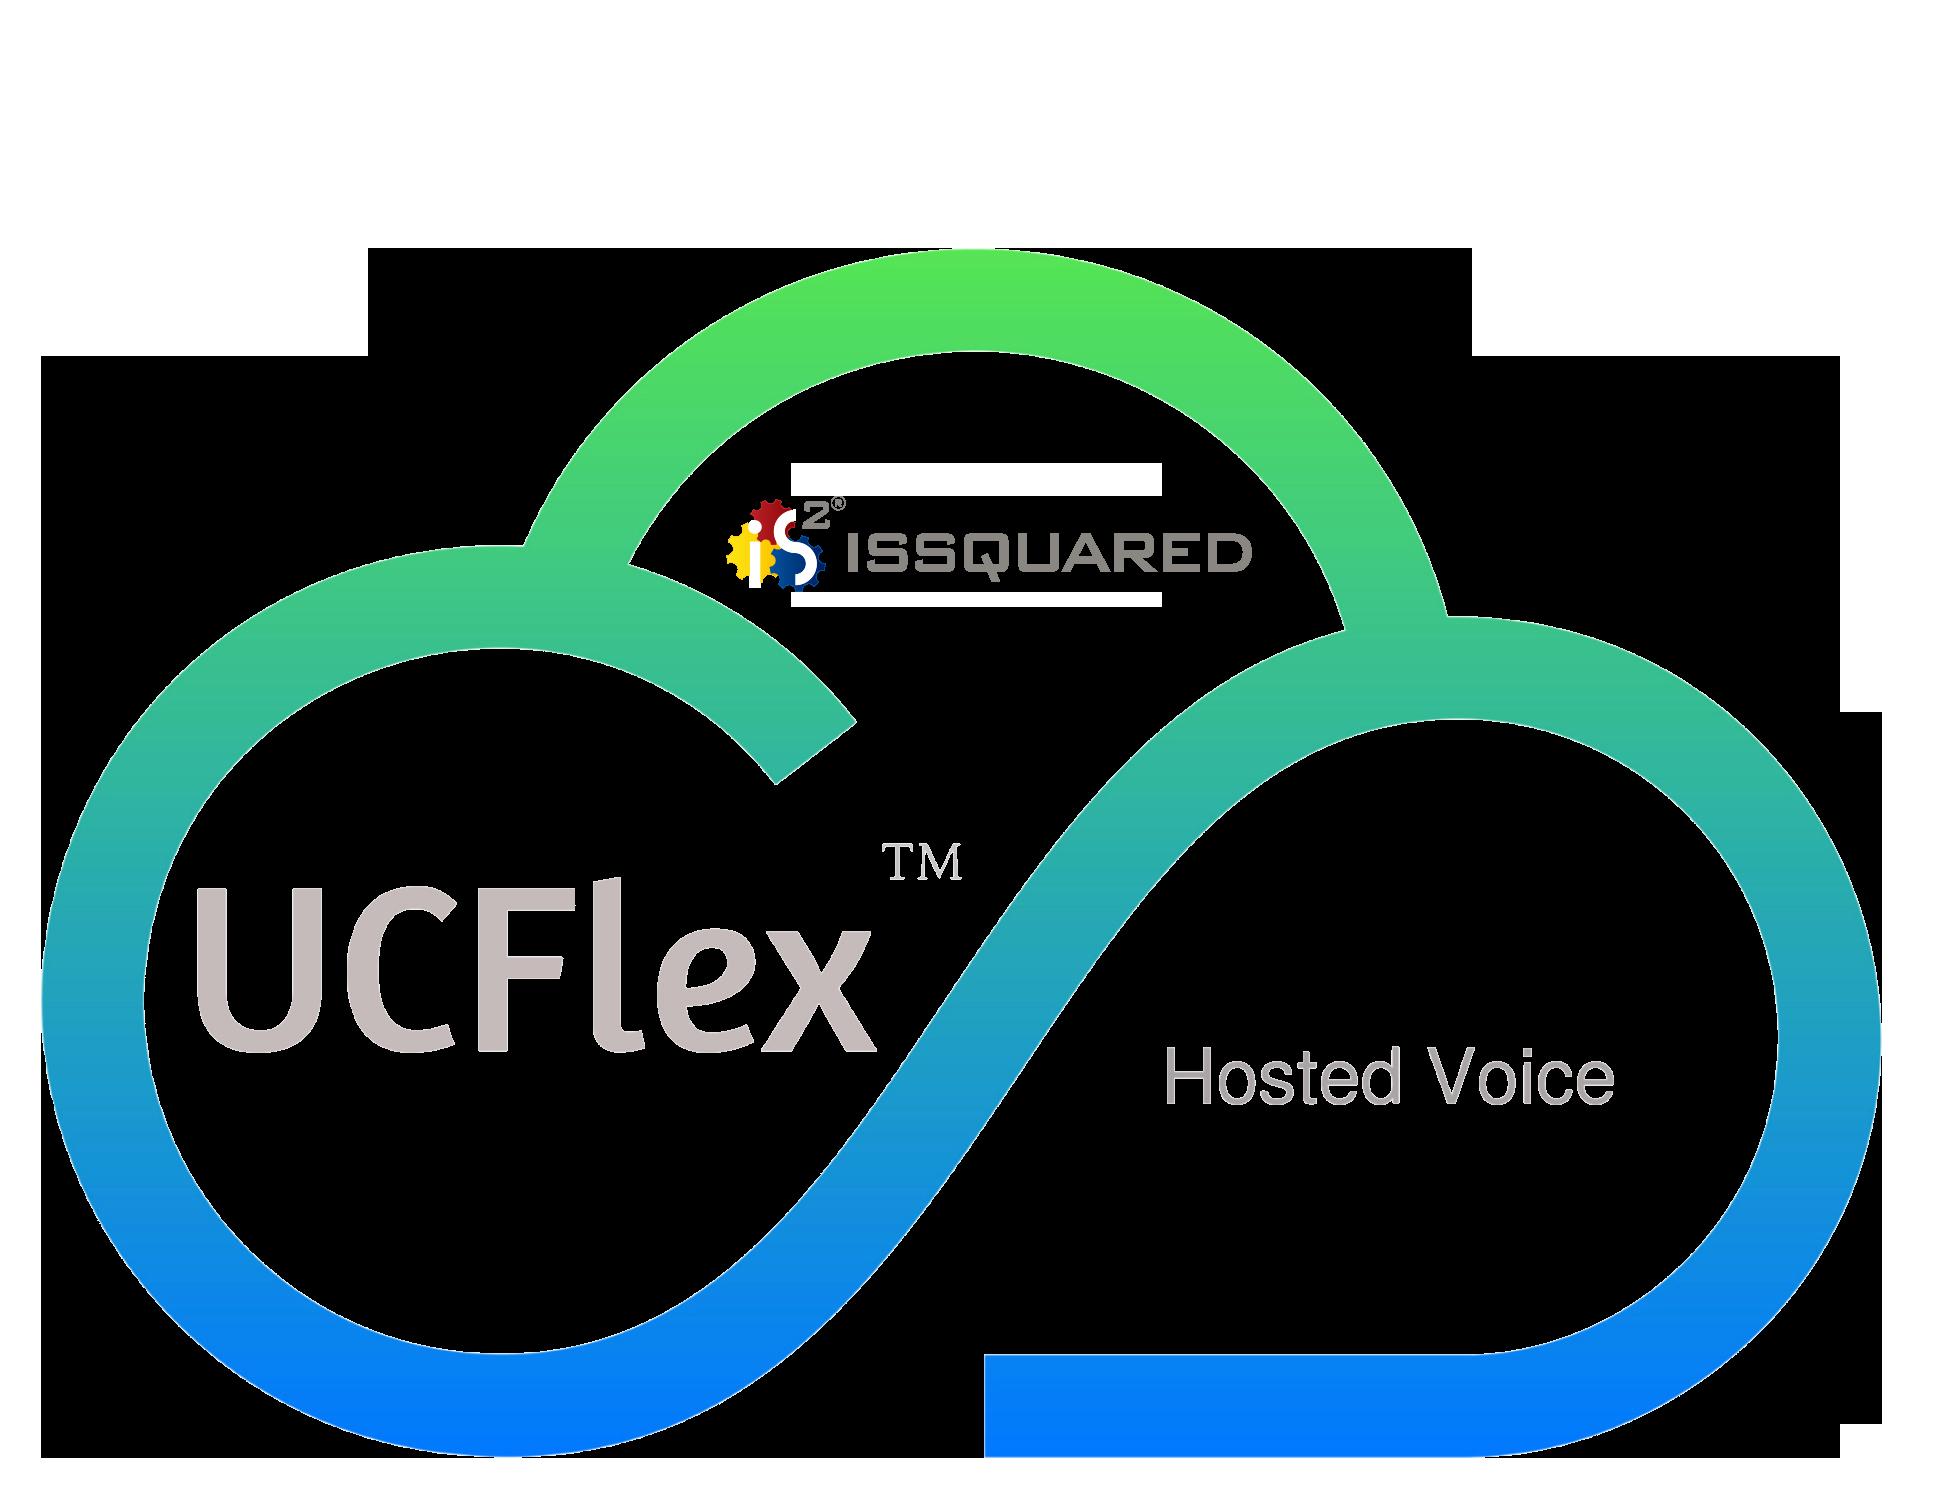 ucflex.uc edu